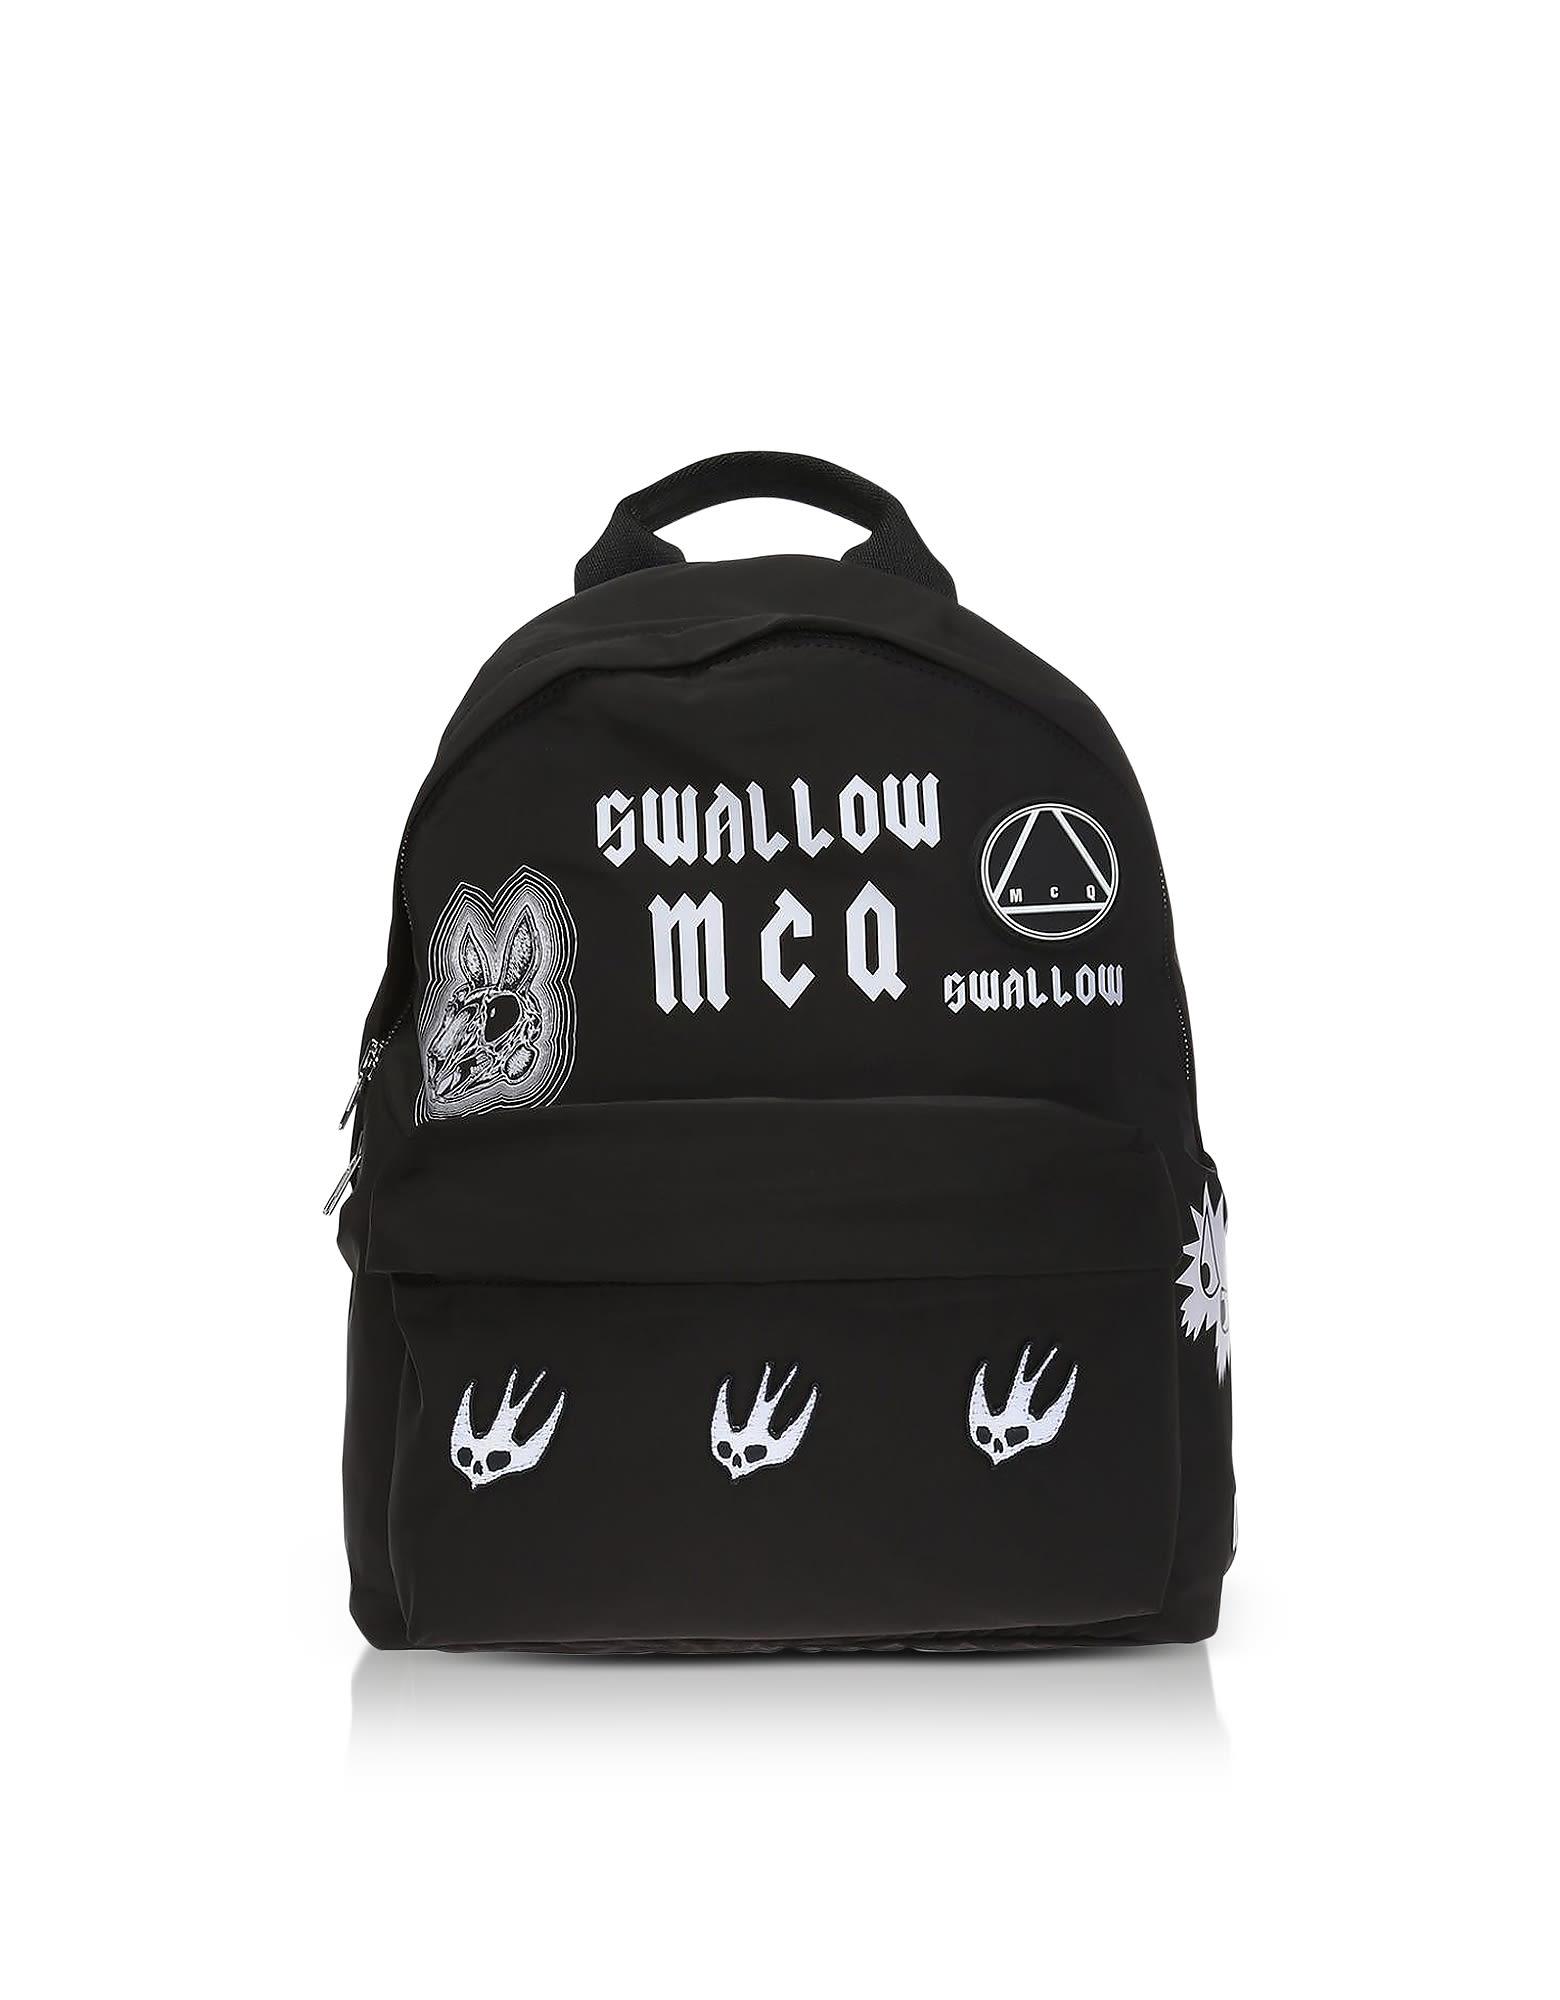 fc96c7b9f24 Mcq By Alexander Mcqueen Mcq Alexander Mcqueen Sponsorship Black Nylon  Women S Backpack W  Badges